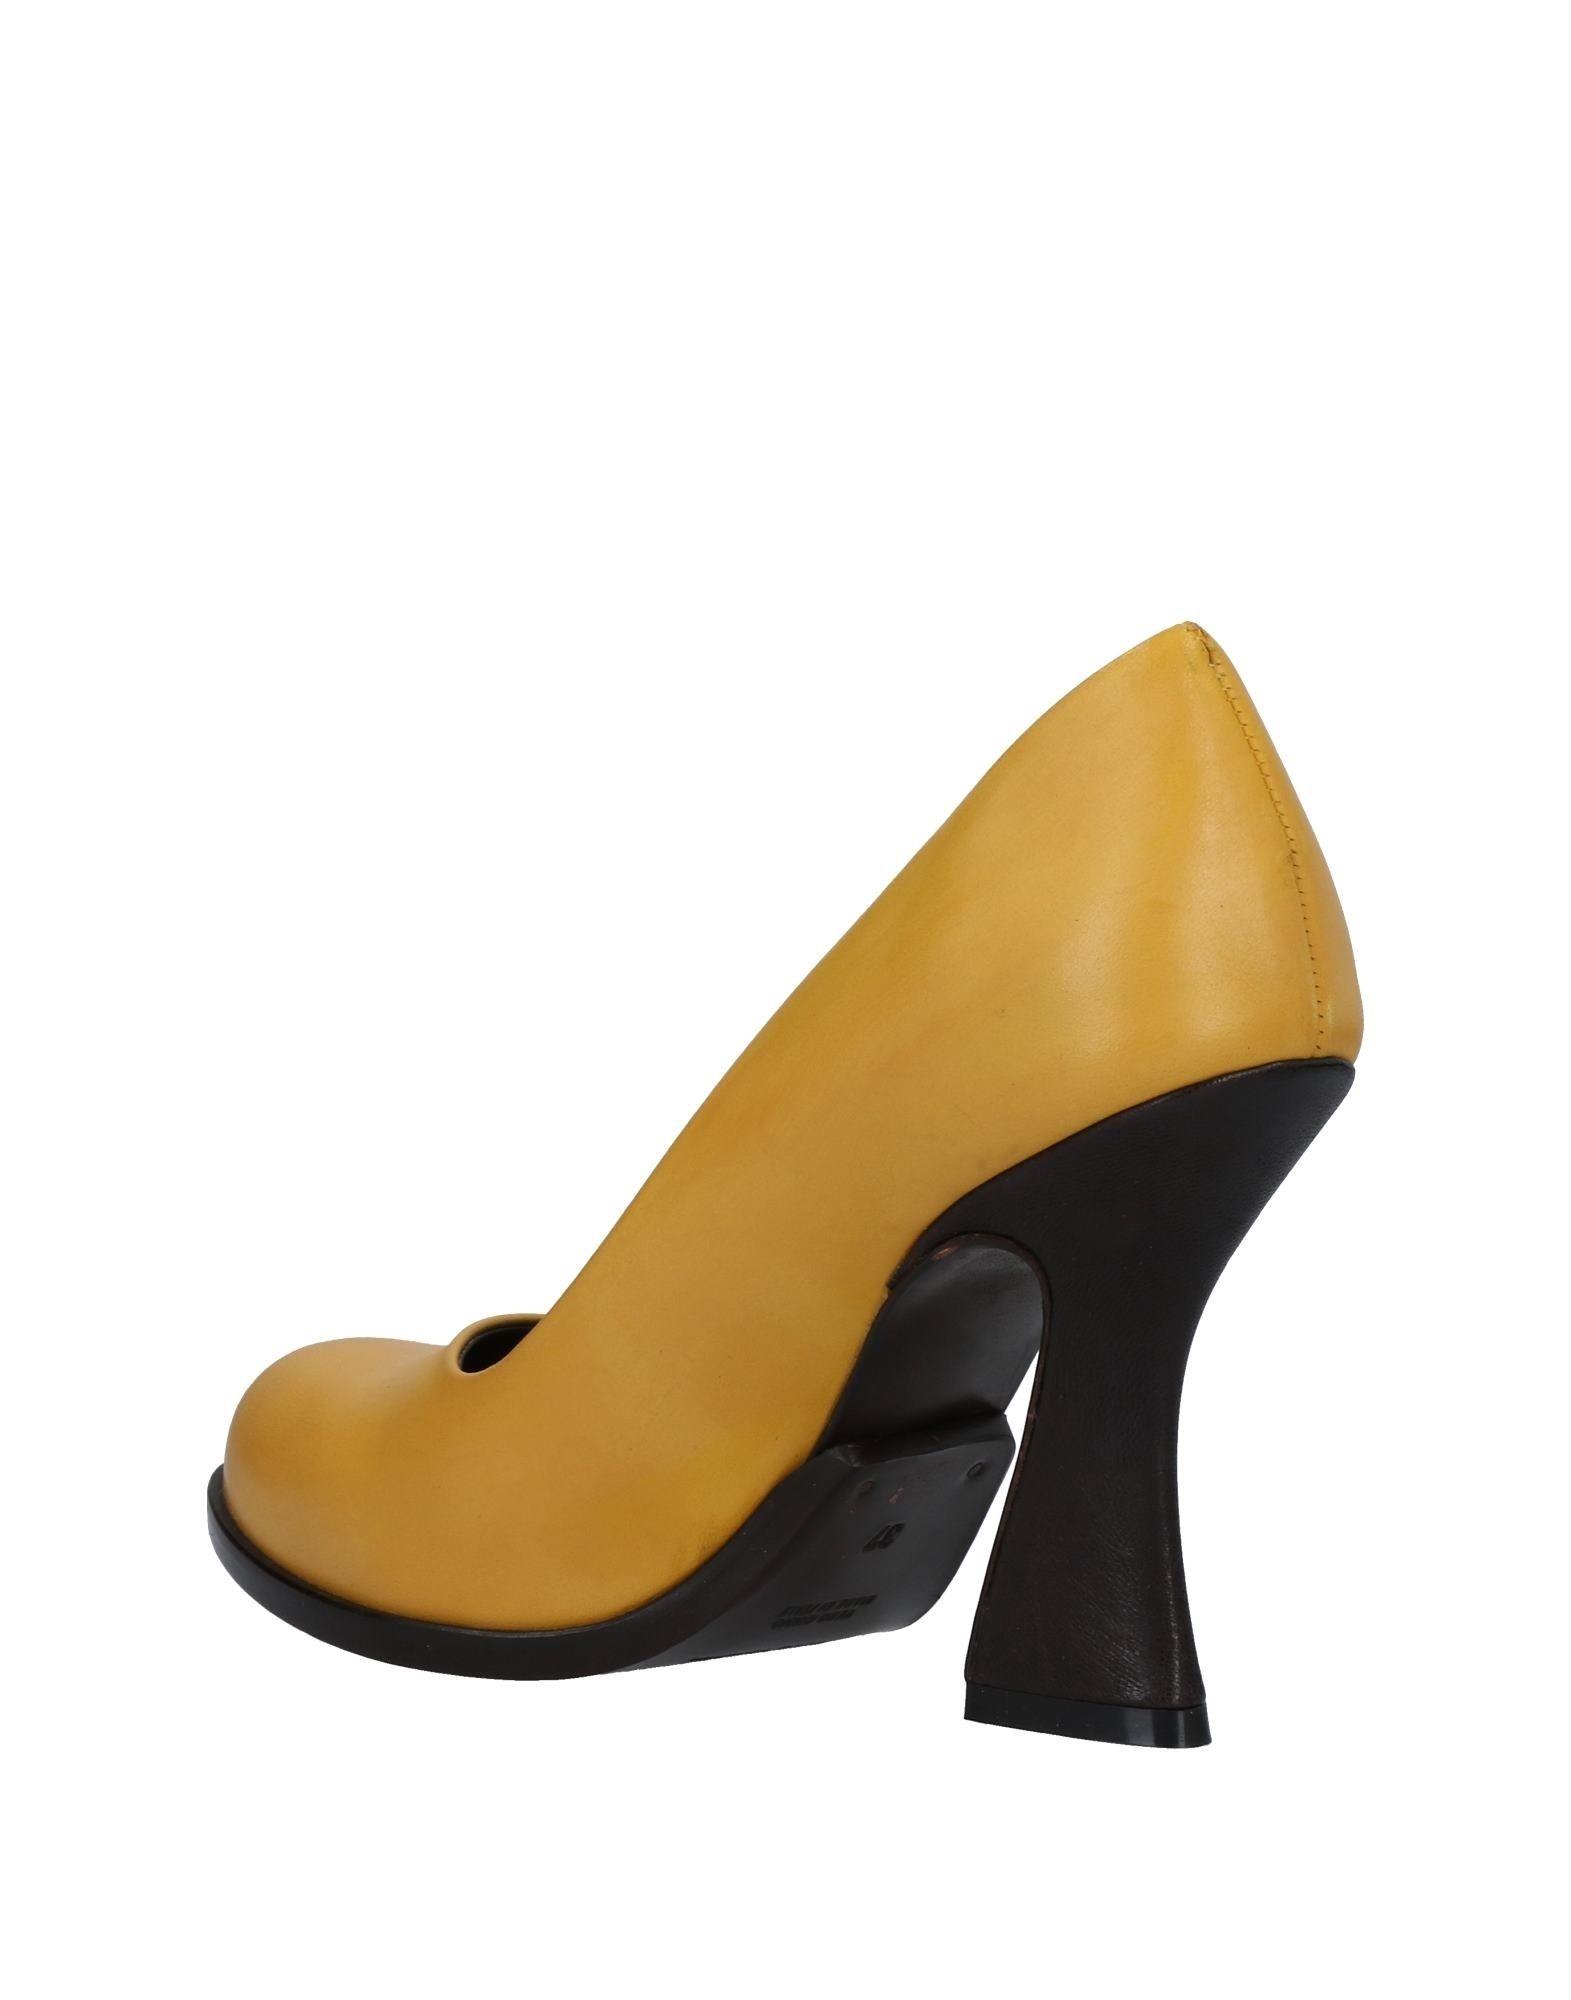 Stilvolle billige Schuhe Luca Valentini 11277729MP Pumps Damen  11277729MP Valentini 5149de